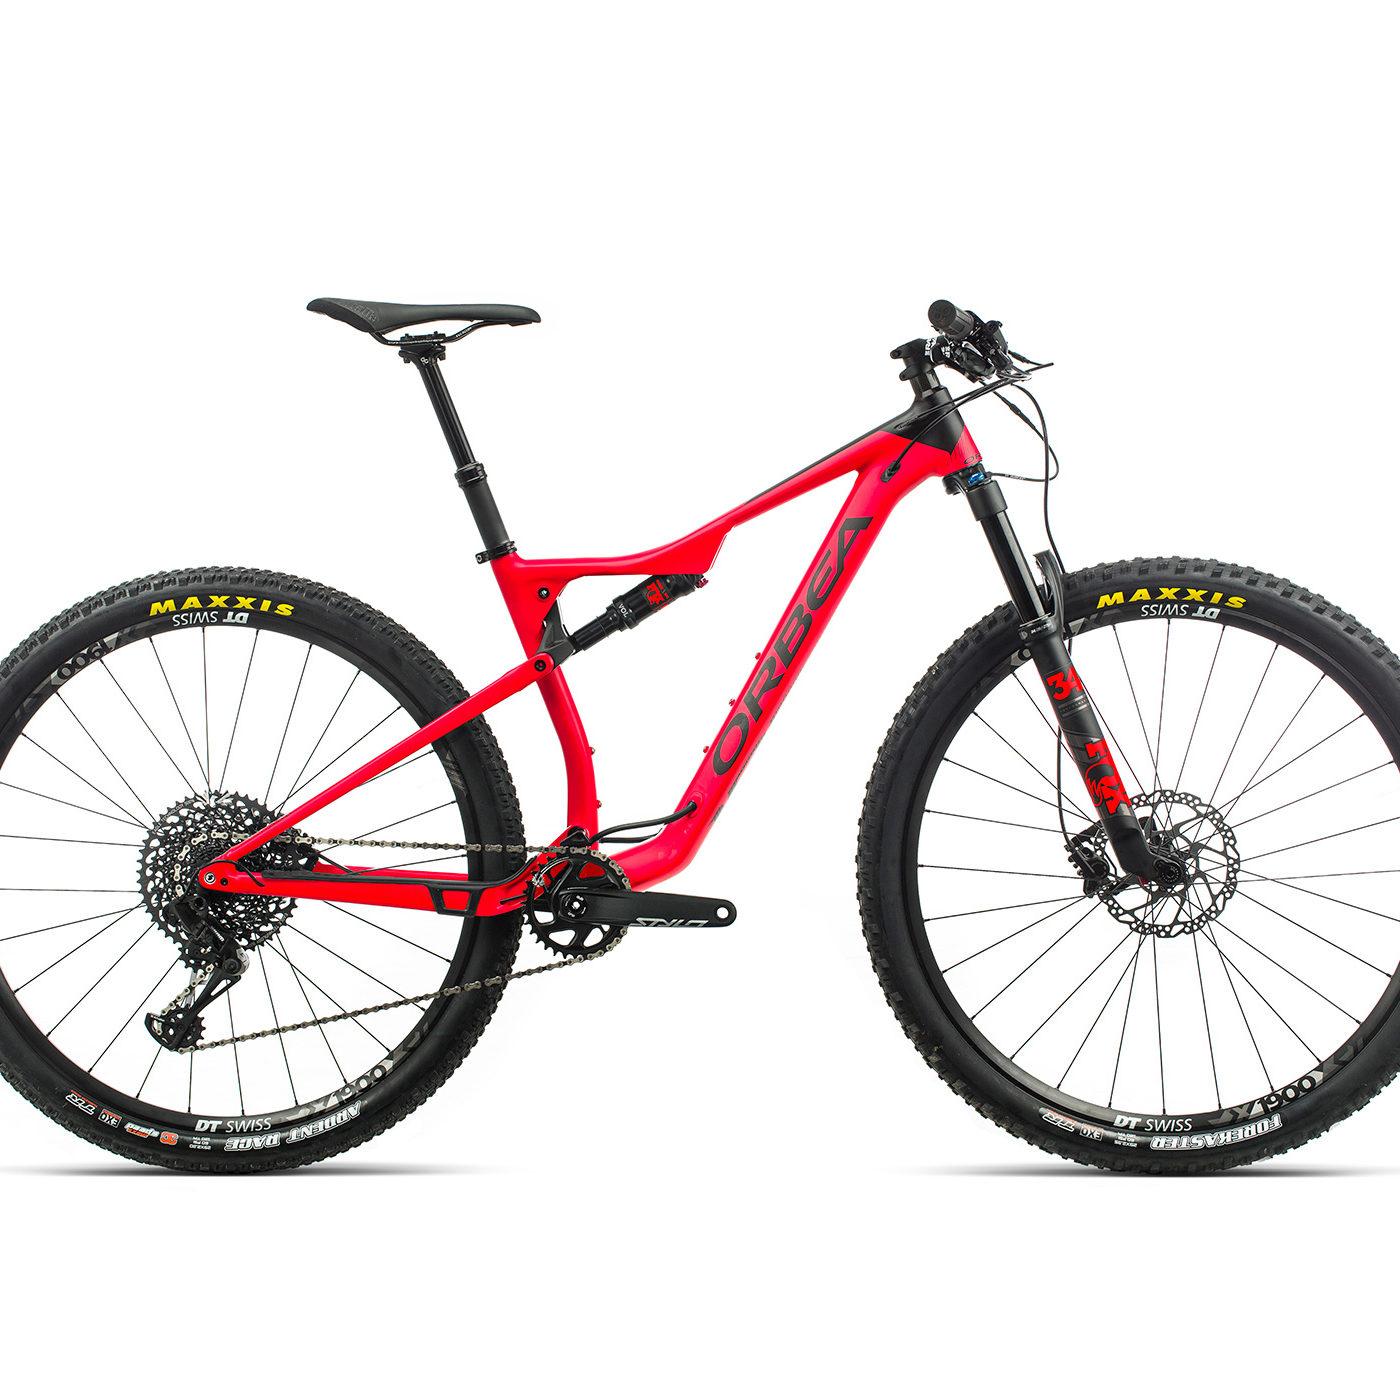 ORBEA OIZ 29 H10 - BRIGHT RED / ZWART (DOF) @G-Bikes